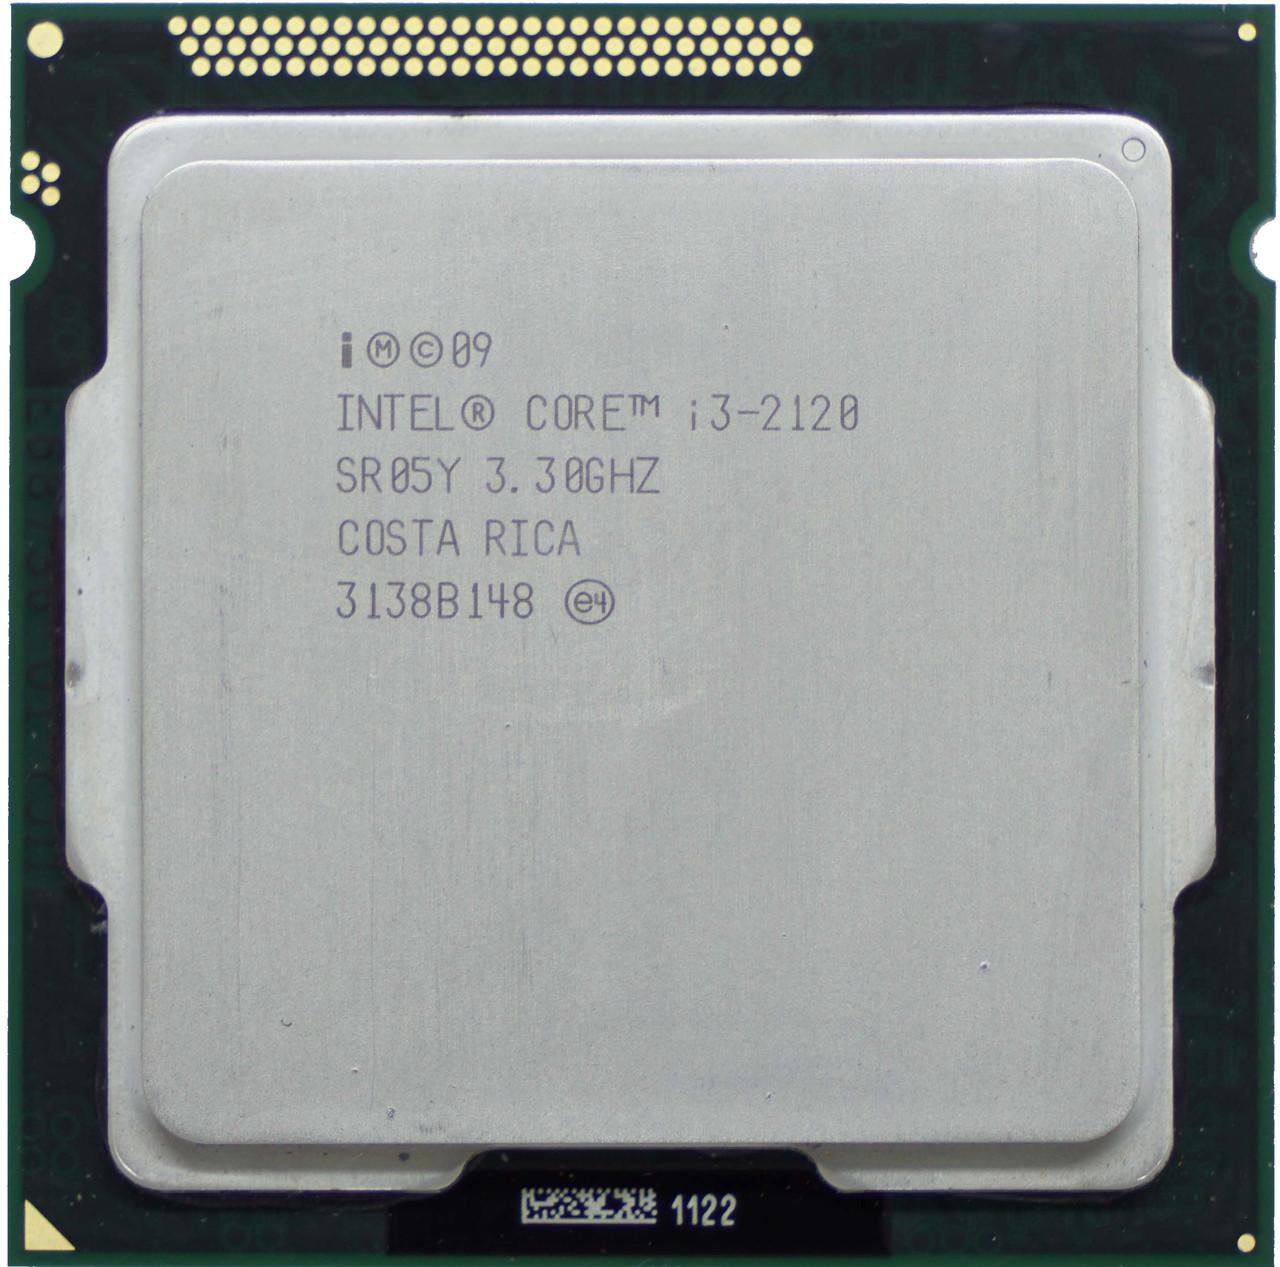 Процессор Intel Core i3-2120 3.3GHz/3MB/5GT/s (SR05Y) s1155, tray